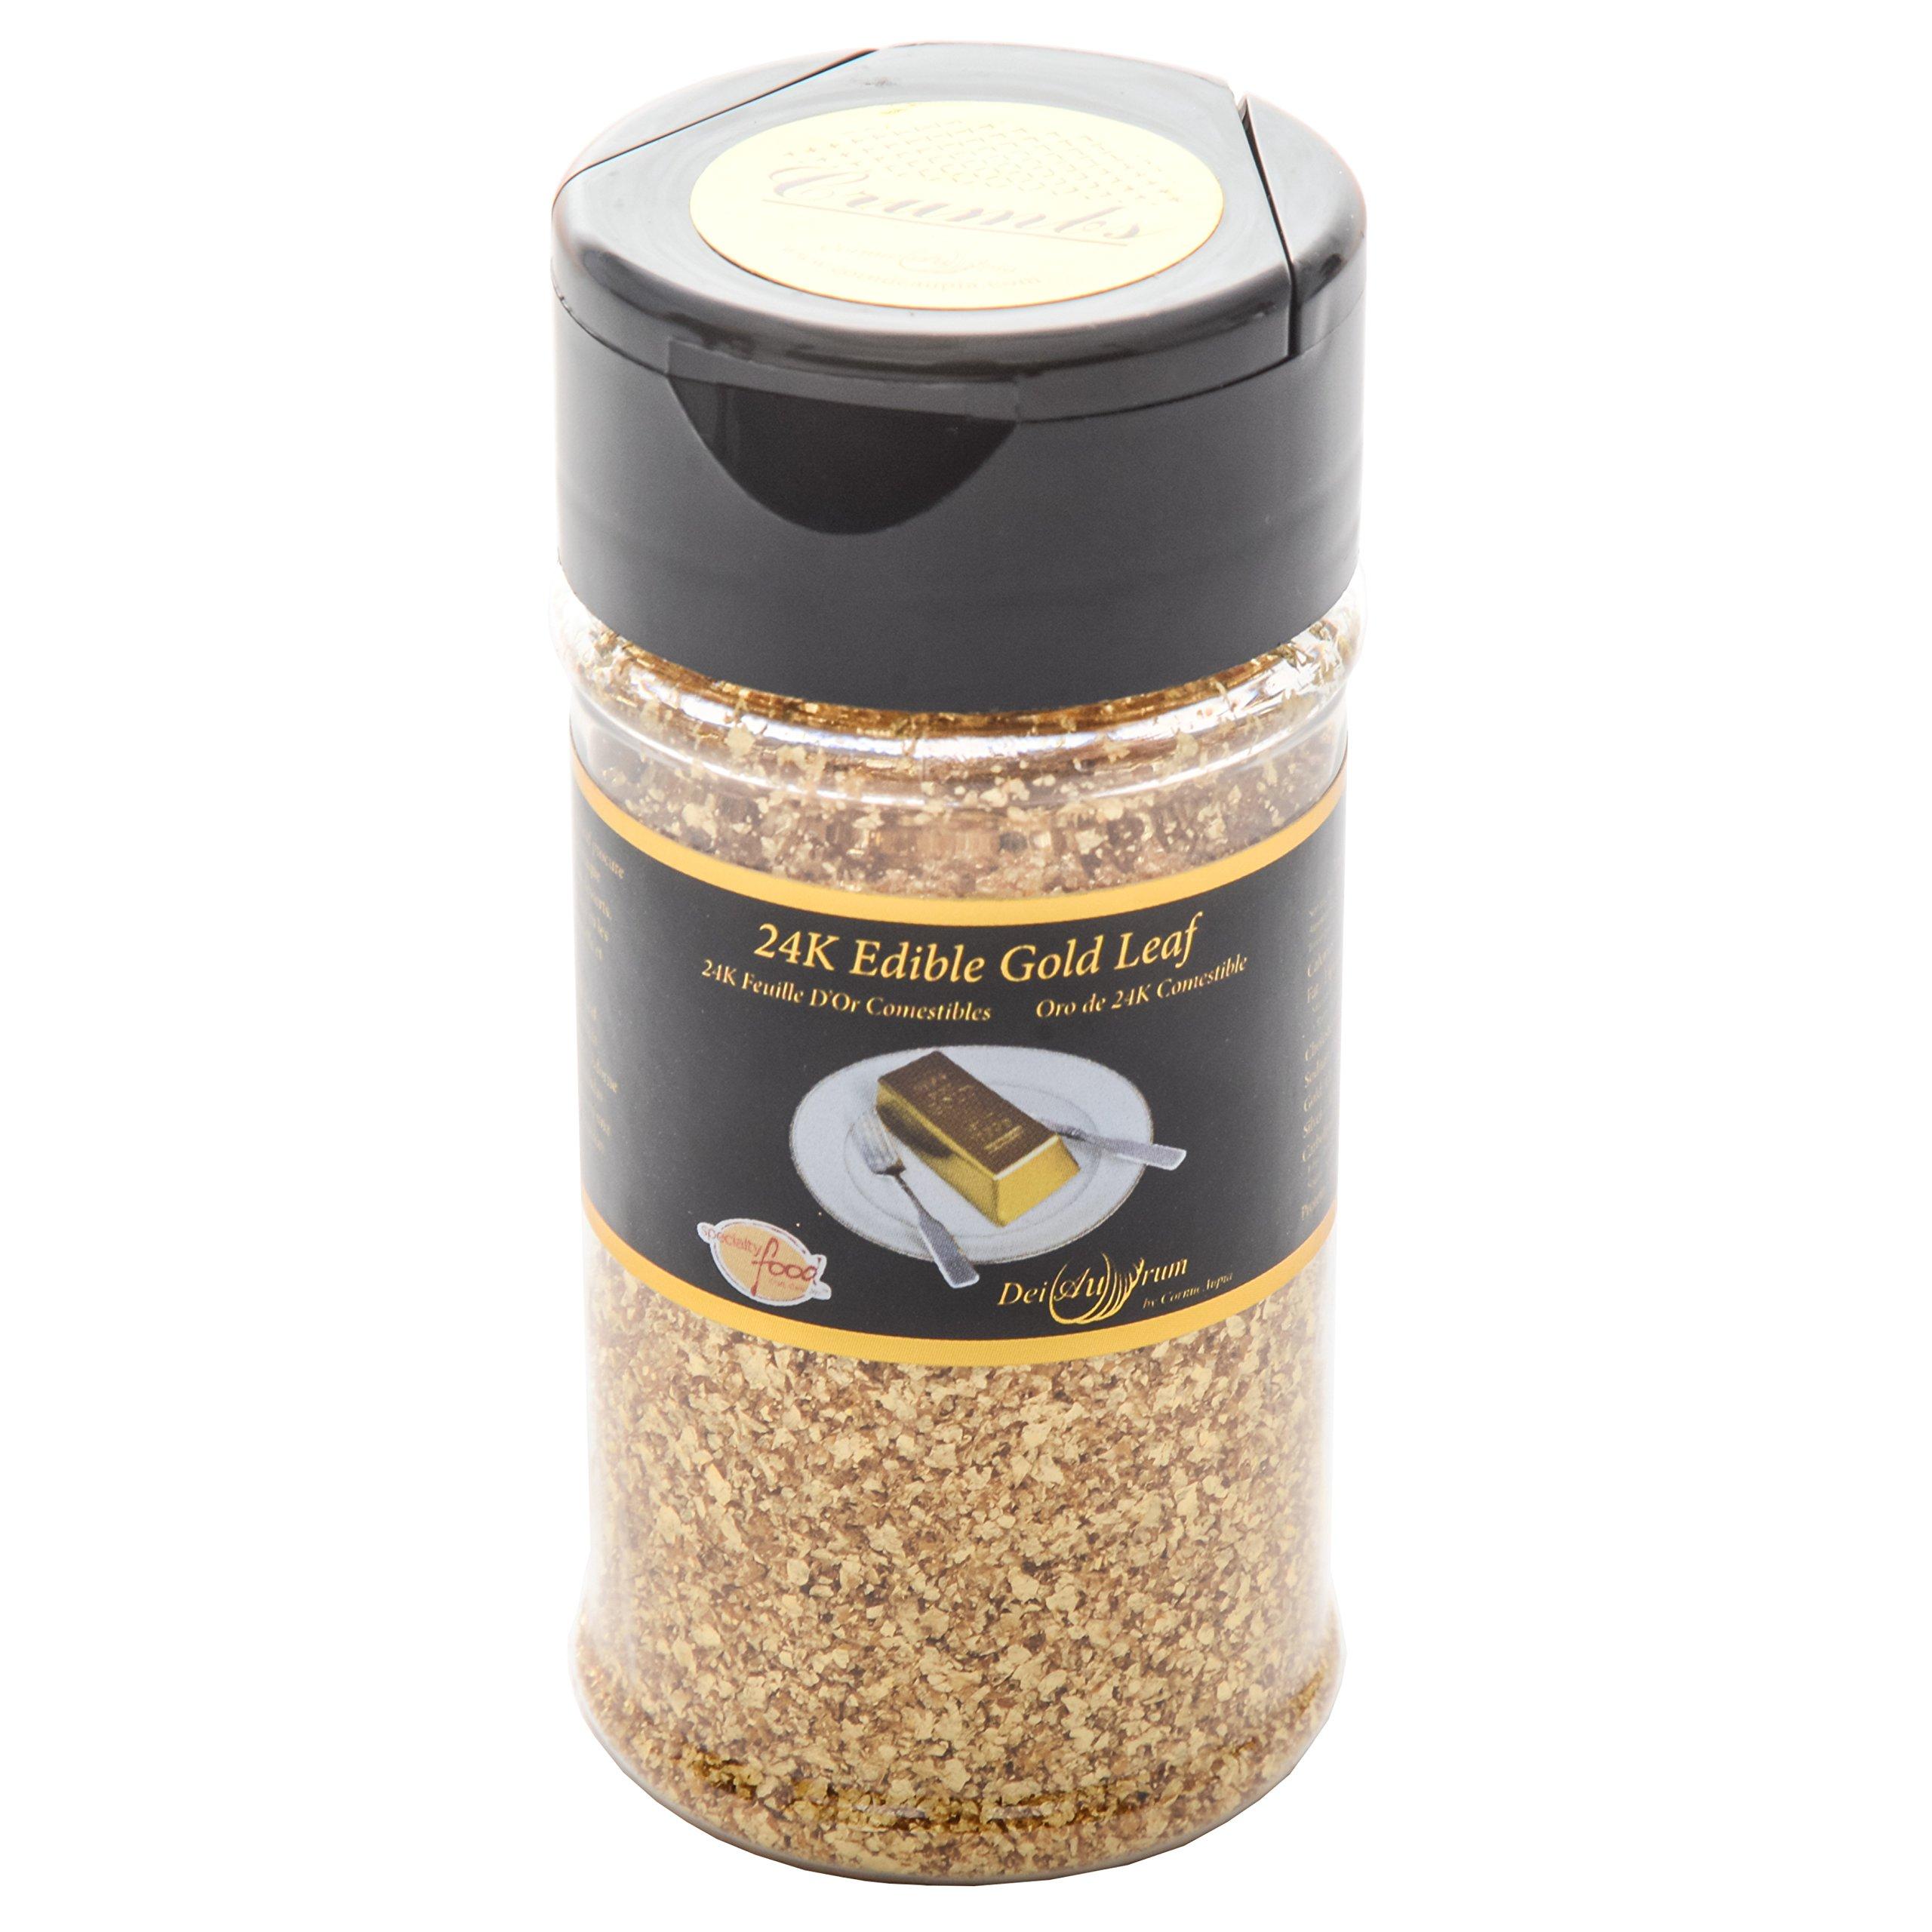 24K Edible Gold Leaf Crumbs, Shaker, 0.500g